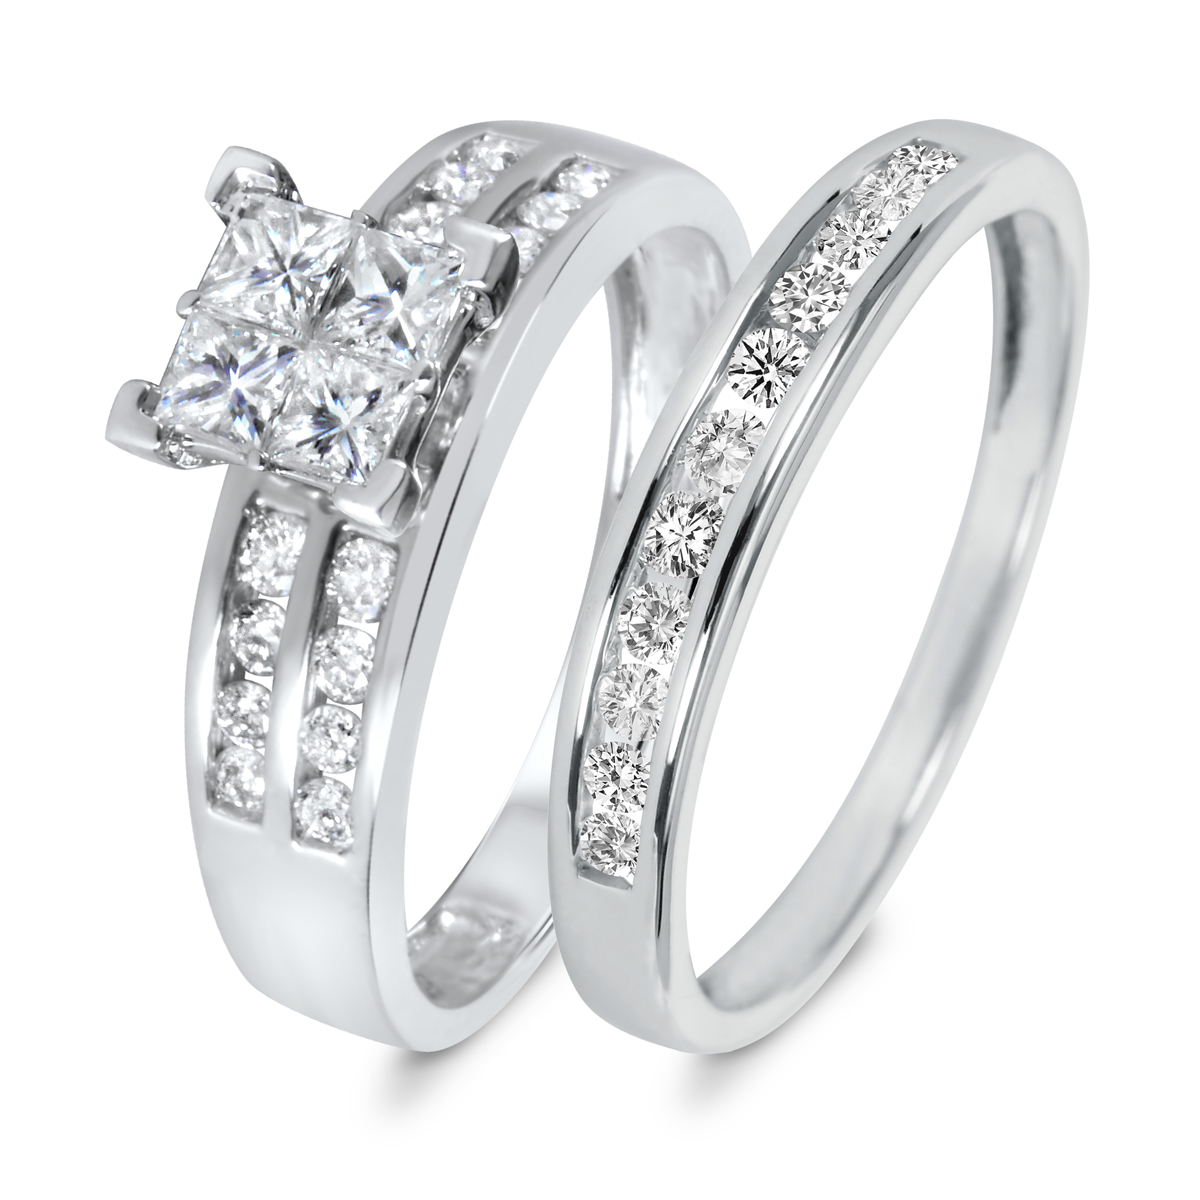 1 1/10 CT. T.W. Diamond Women's Bridal Wedding Ring Set 10K White Gold